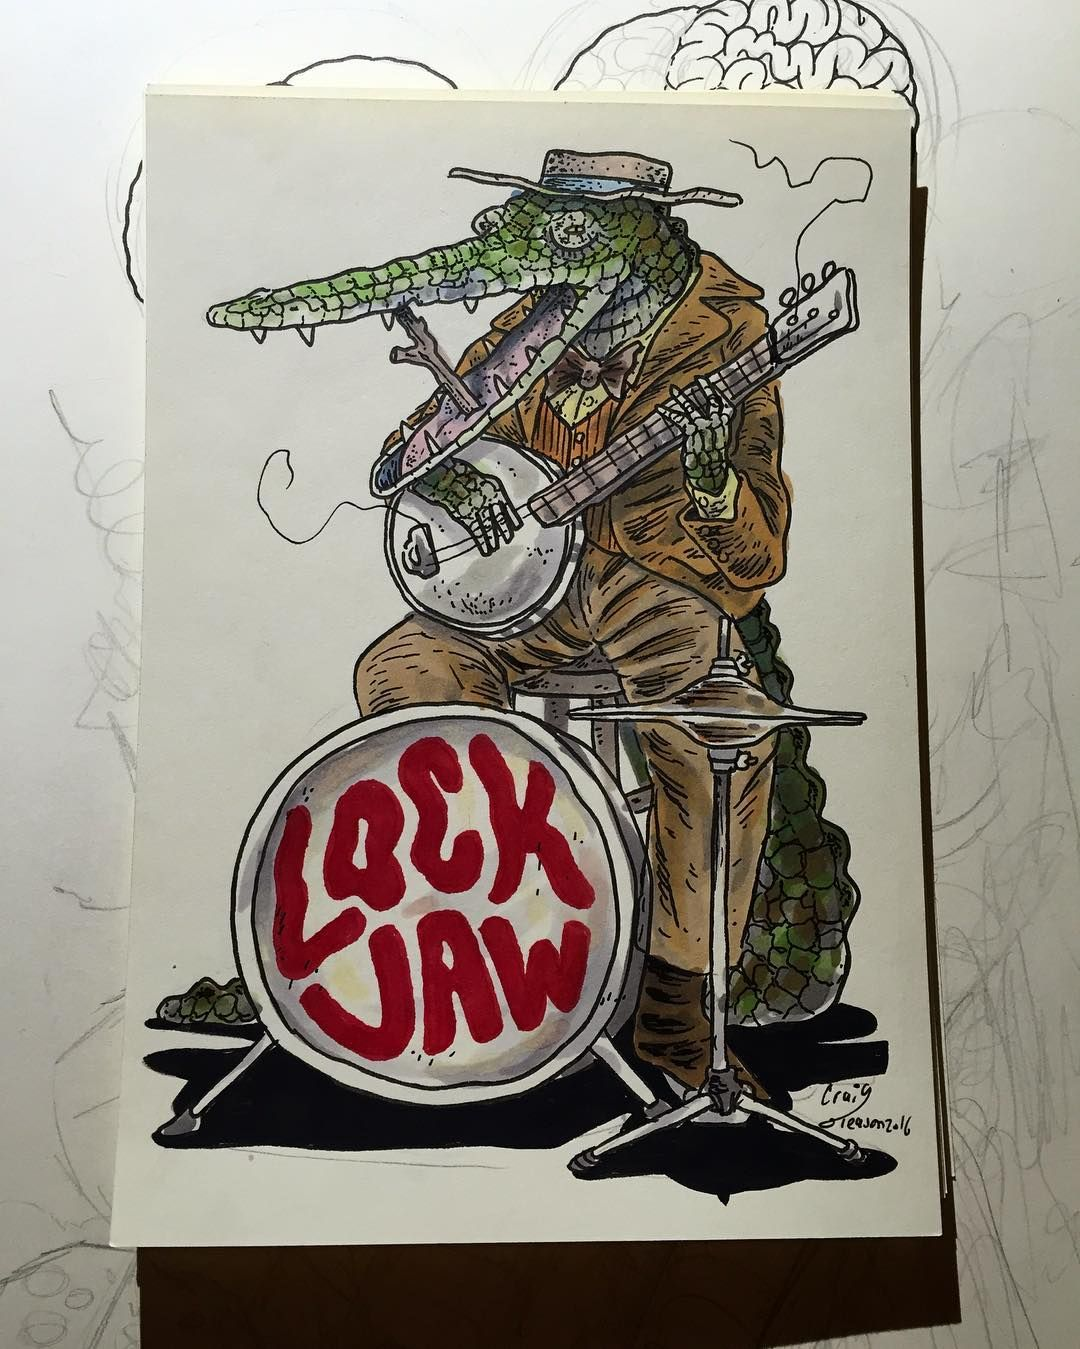 Auction lockjaw alrighty folks we have a gator singing